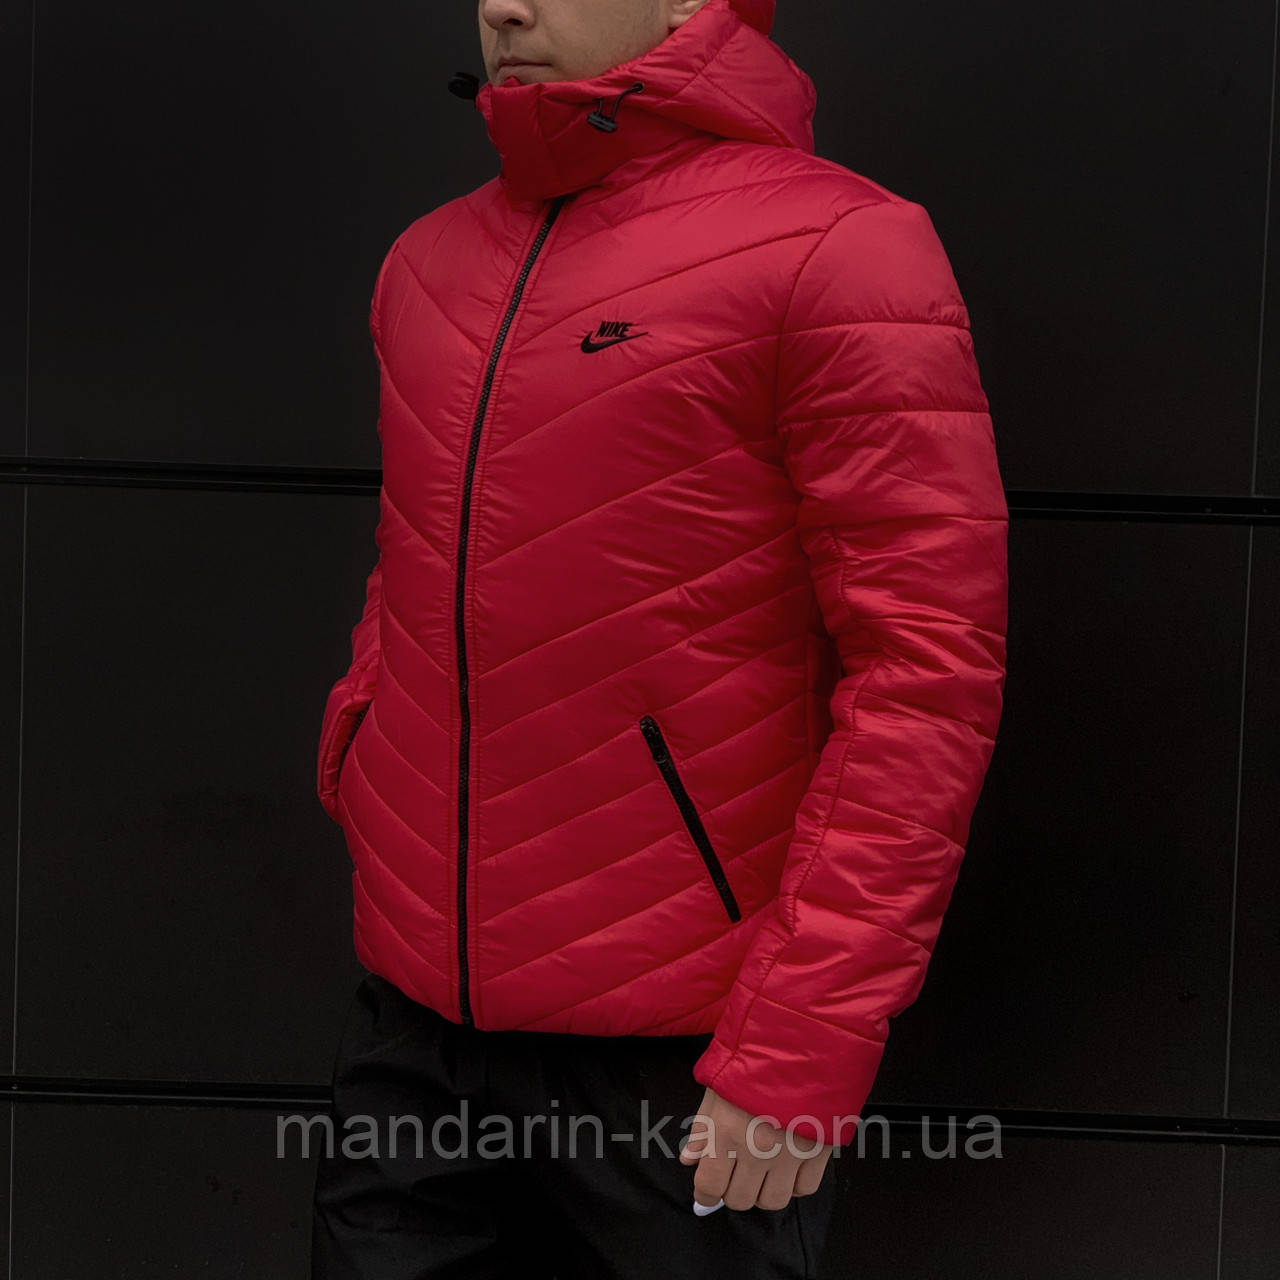 Куртка мужская зимняя красная Nike Найк (реплика)